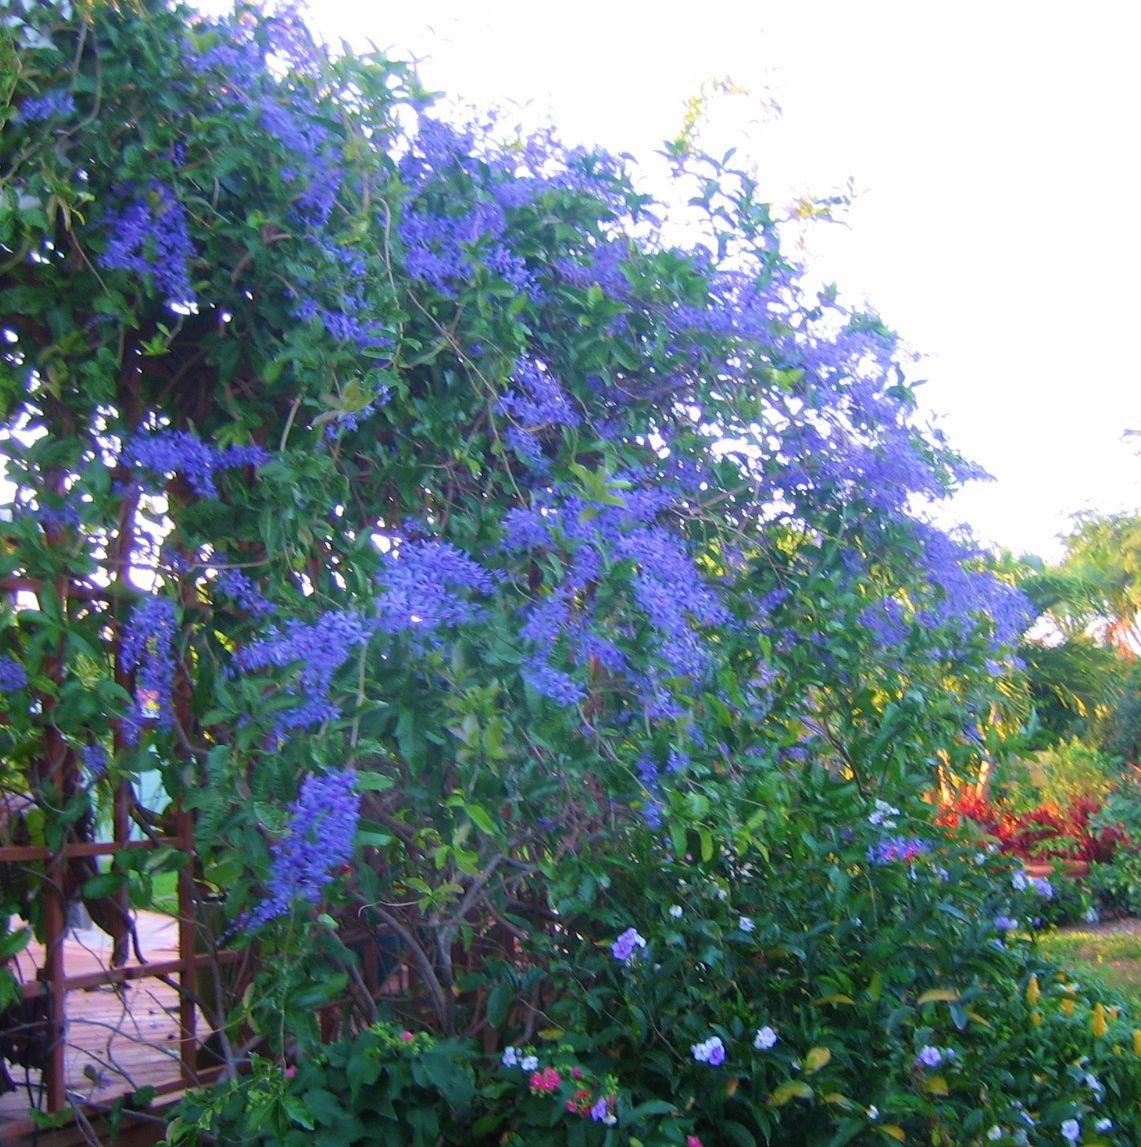 Tropical Wisteria or Petrea Vine for Zone 10 or 11. Needs a strong trellis. Florida cottage gArden.